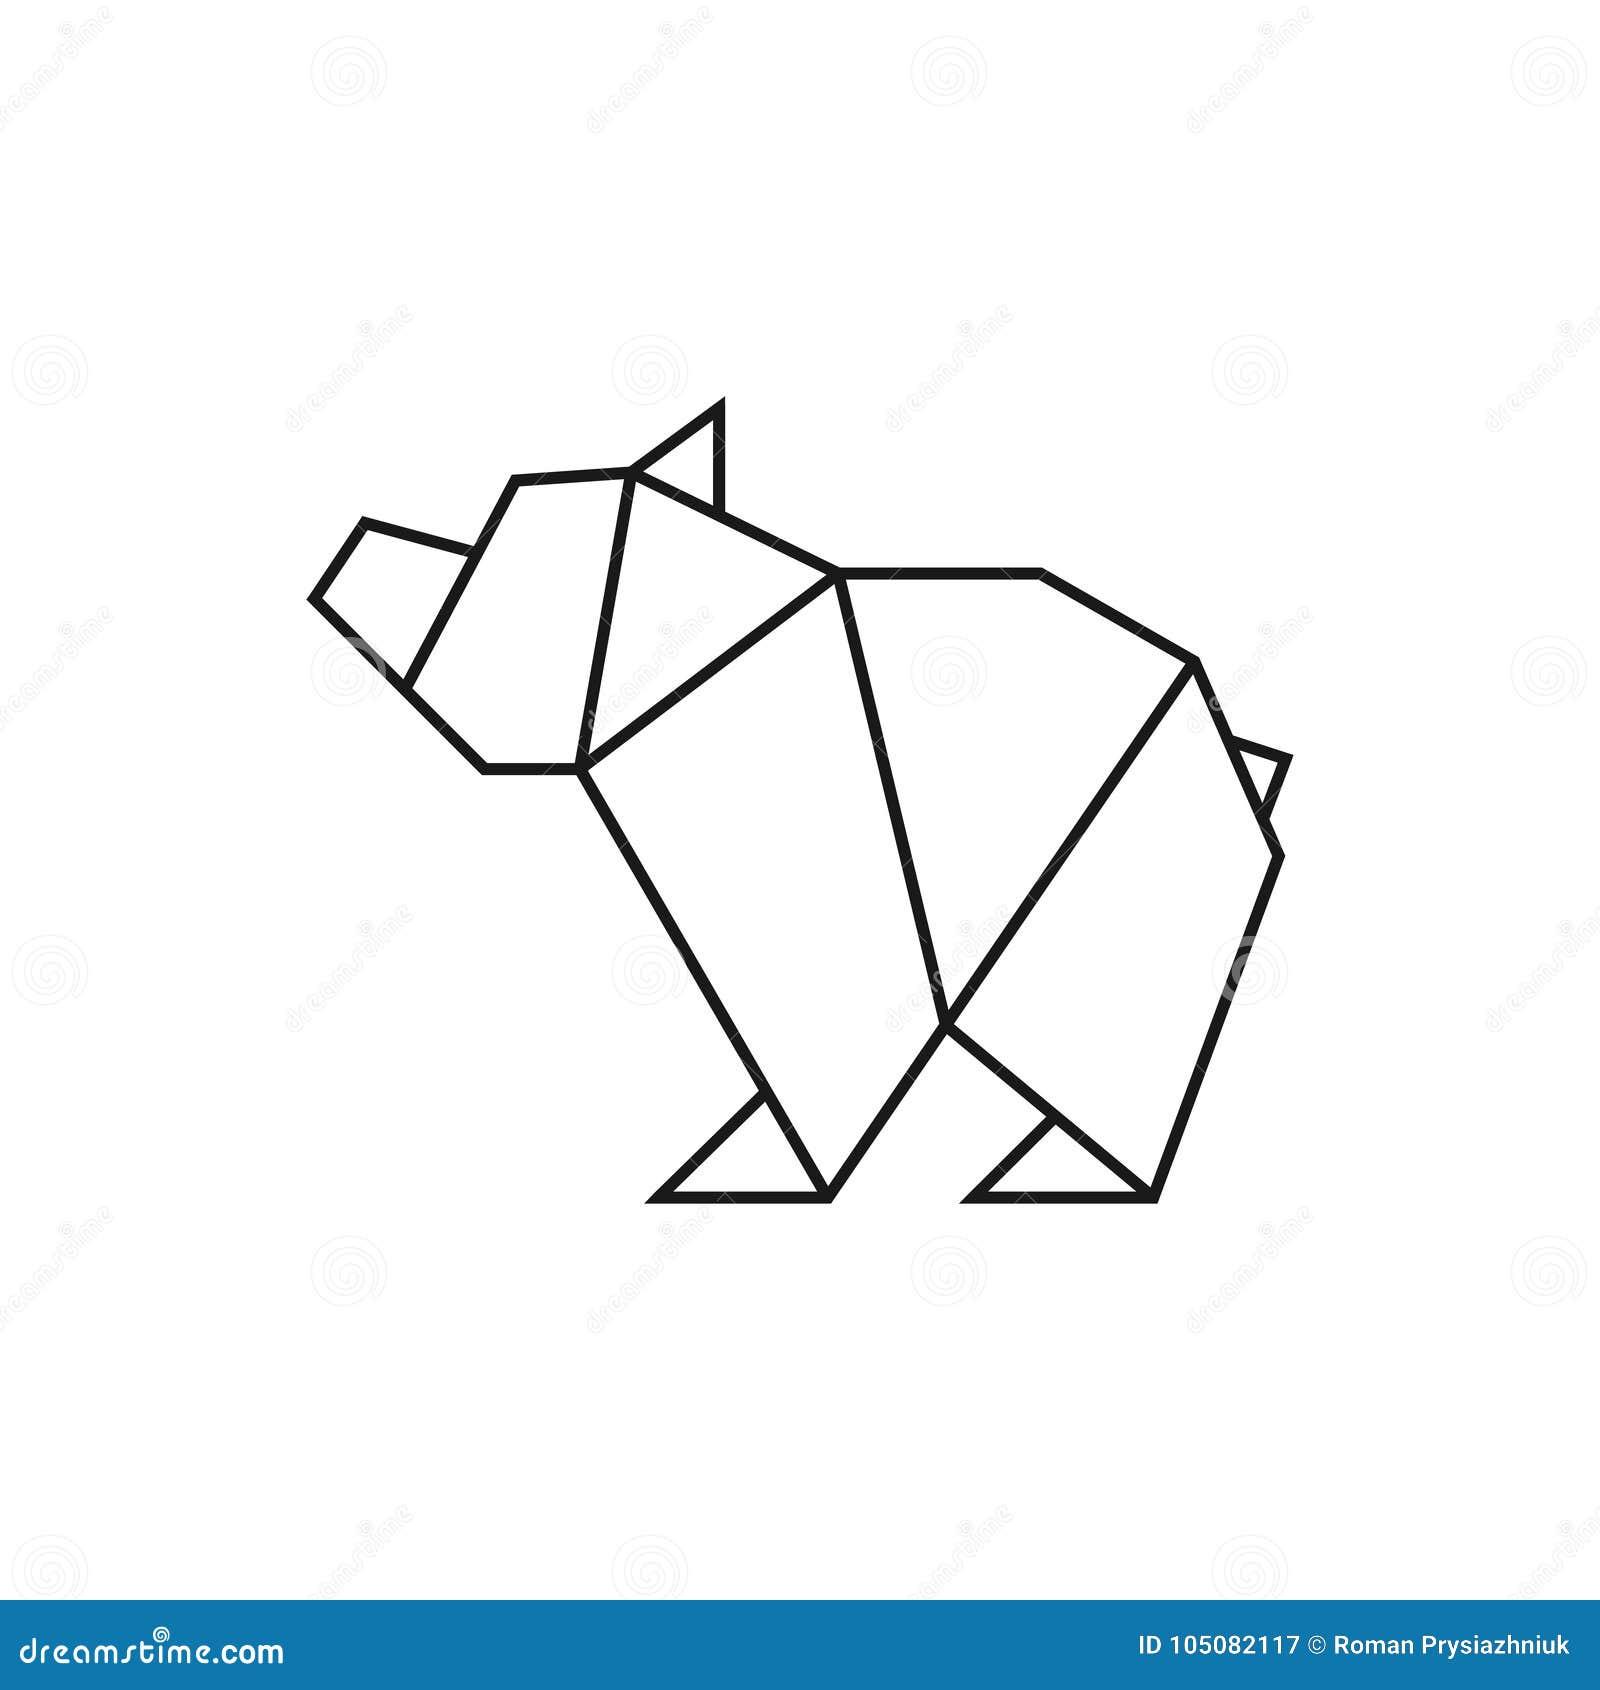 Terrific Origami Bear Geometric Line Shape For Art Of Folded Paper Logo Wiring 101 Olytiaxxcnl